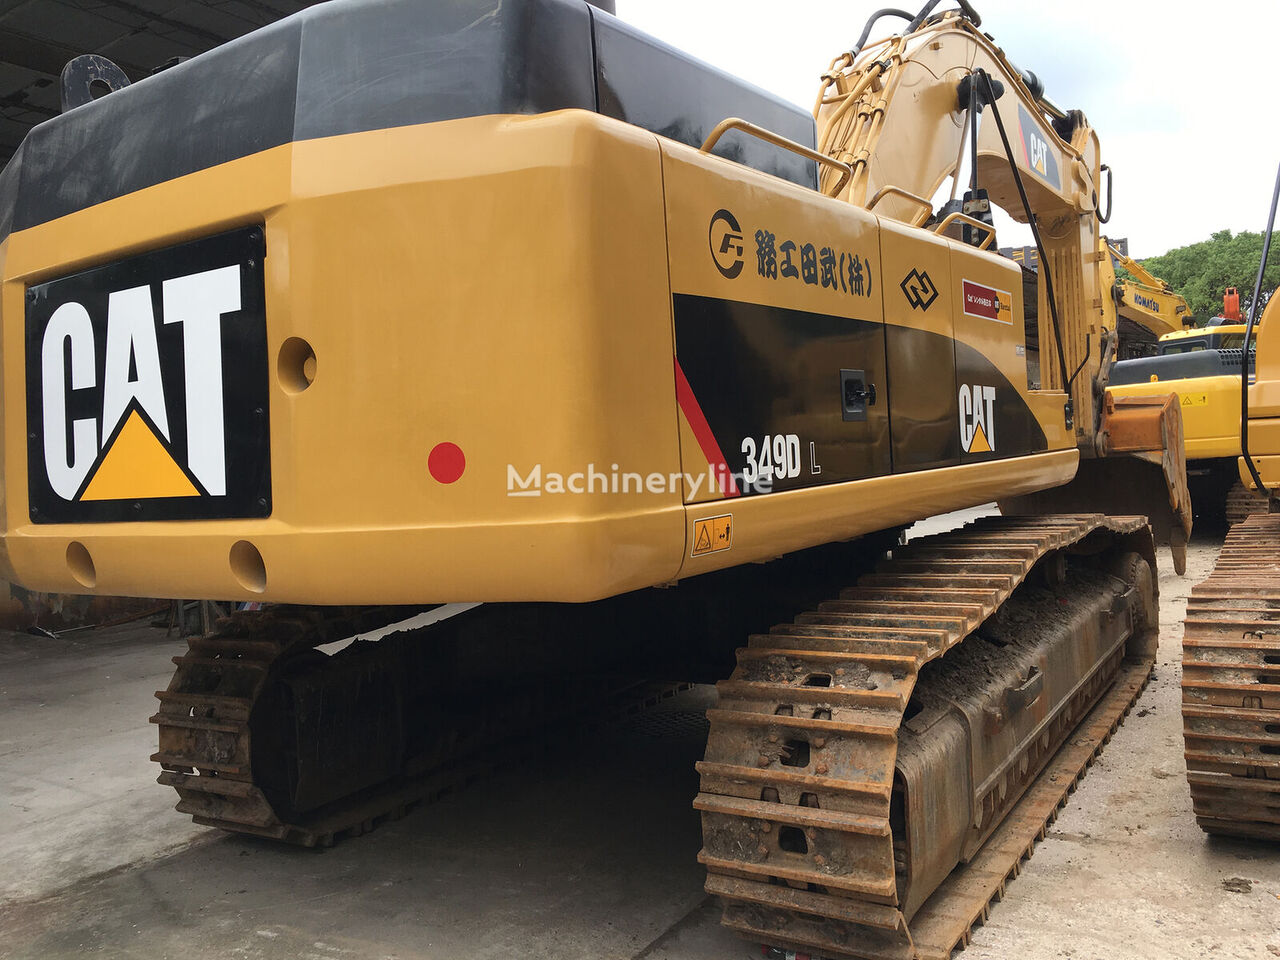 CATERPILLAR 349DL tracked excavator